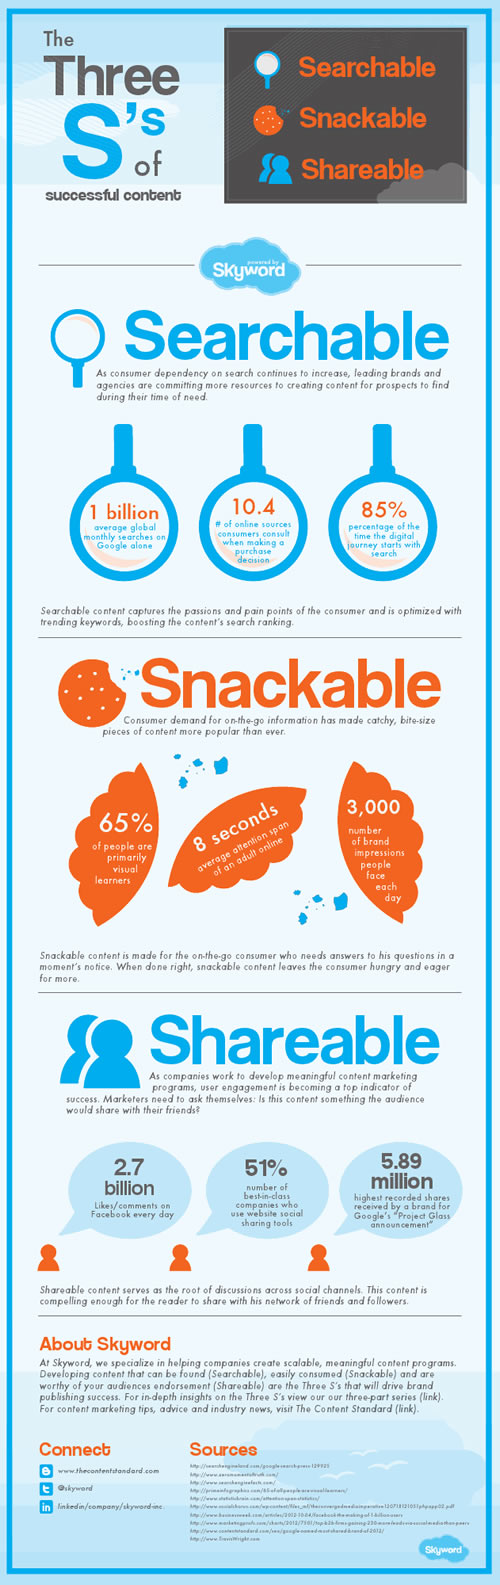 redaccion de contenidos,marketing,infografia